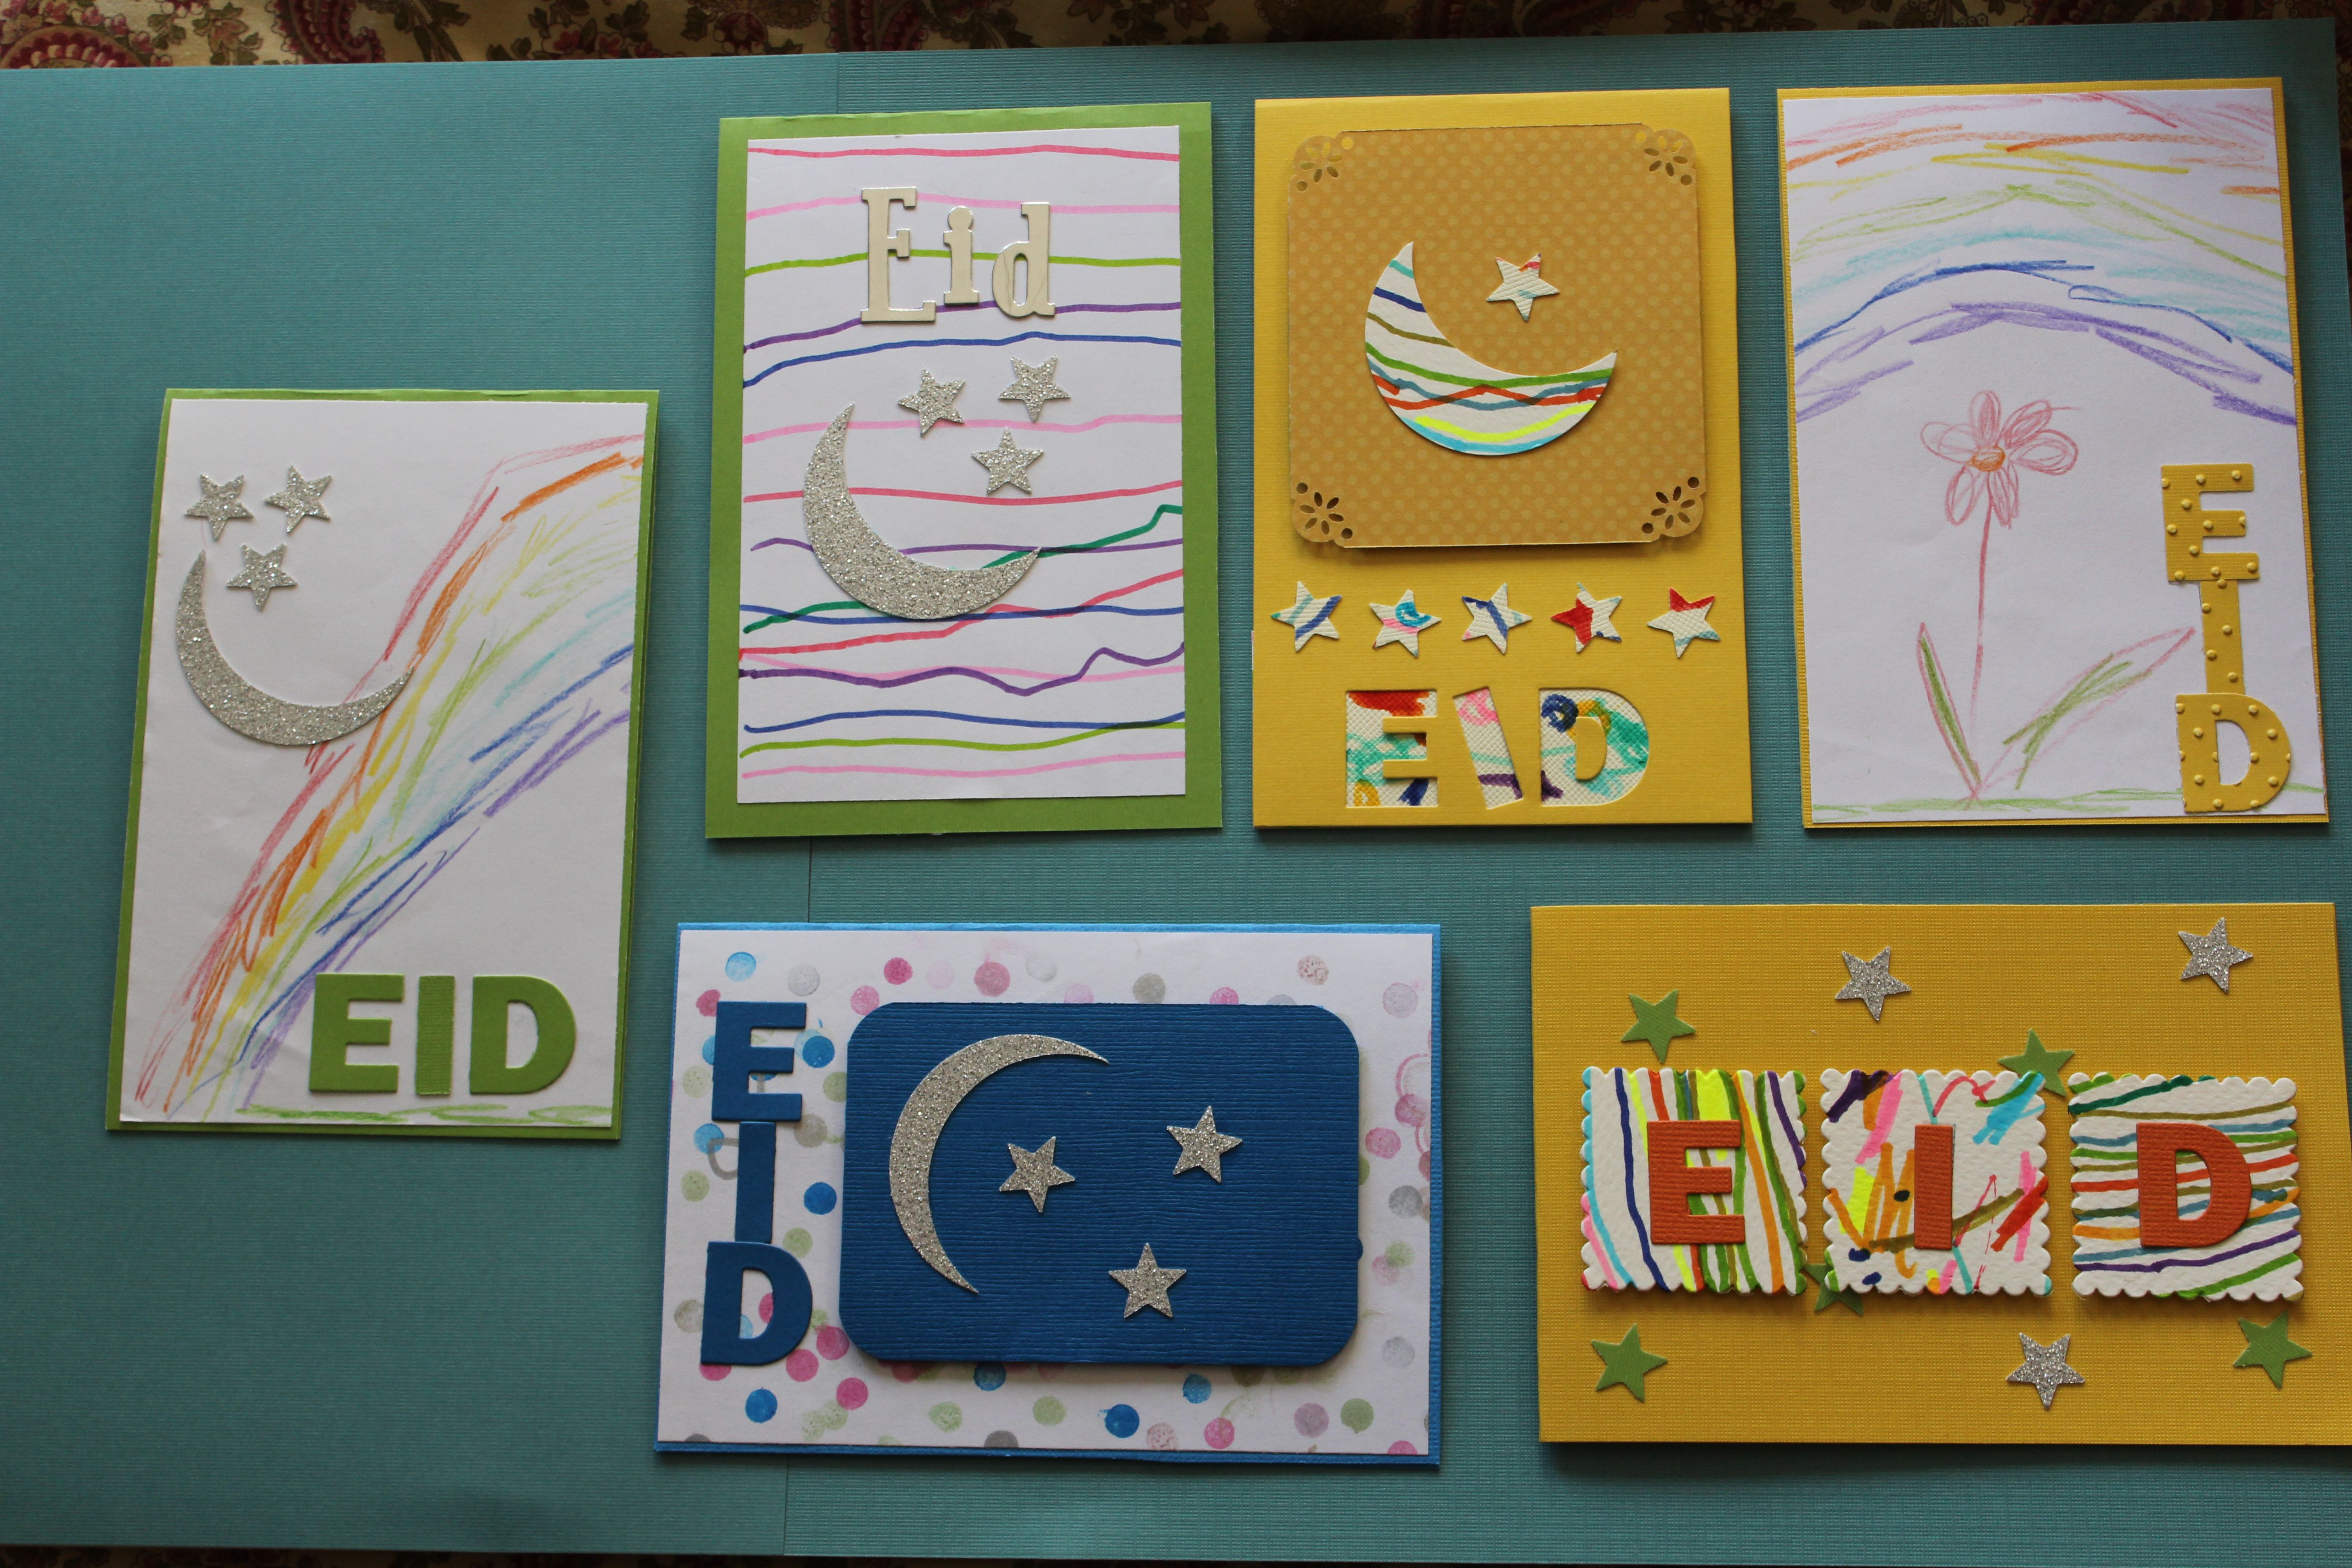 Eid Card Kids Artwork Eid Cards Eid Crafts Ramadan Crafts